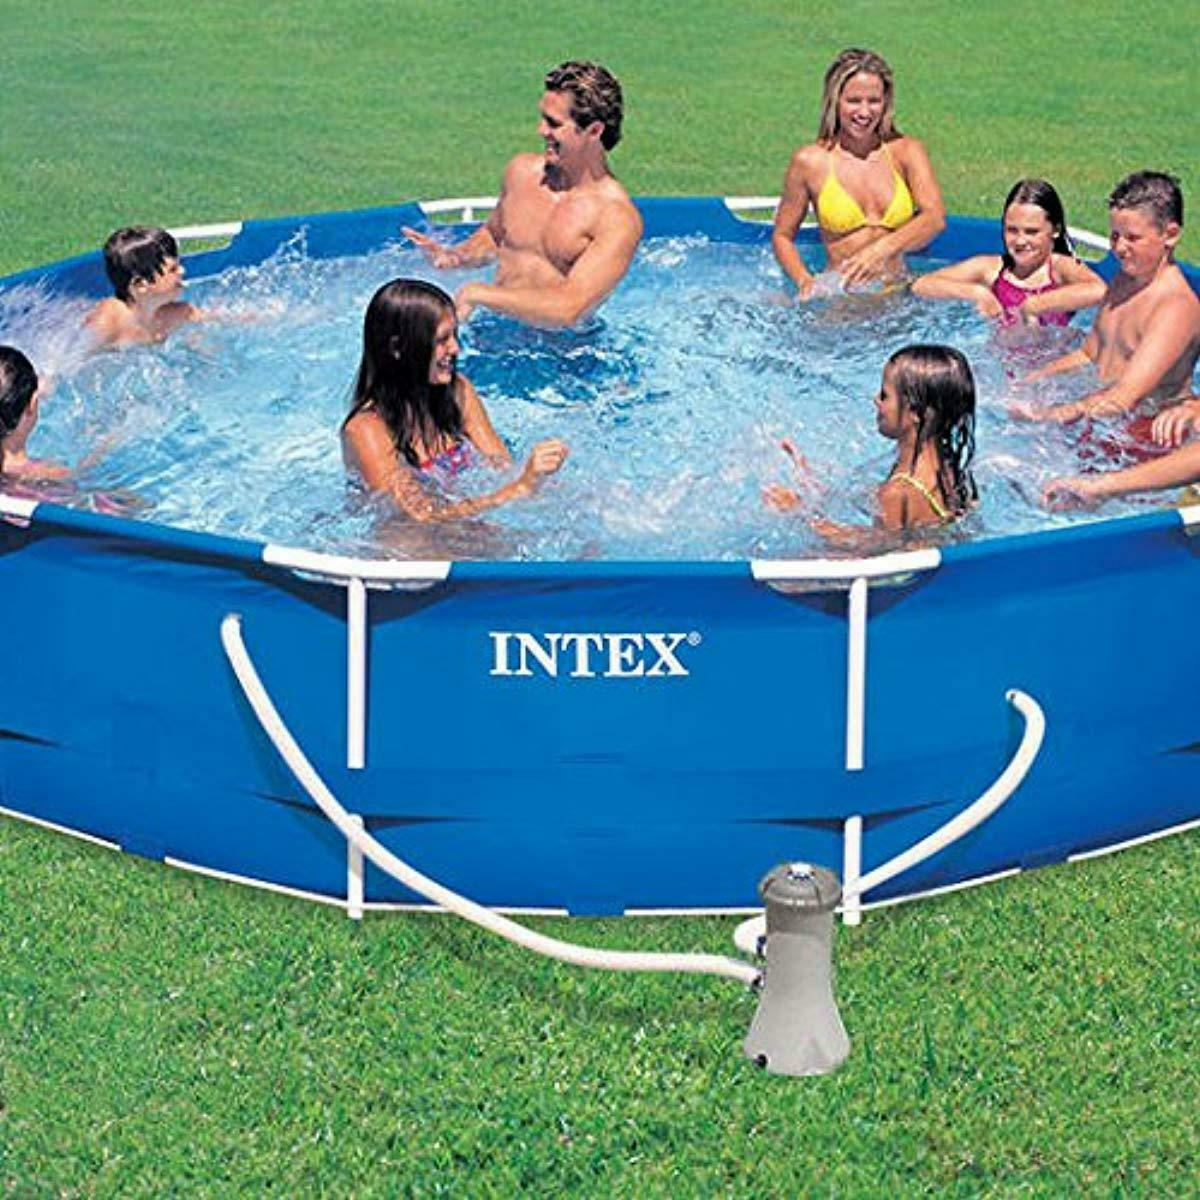 Intex Kit Piscine Tubulaire Ronde 3M66 X 76 Cm, 6500 Liters ... concernant Piscine Tubulaire Intex Ronde